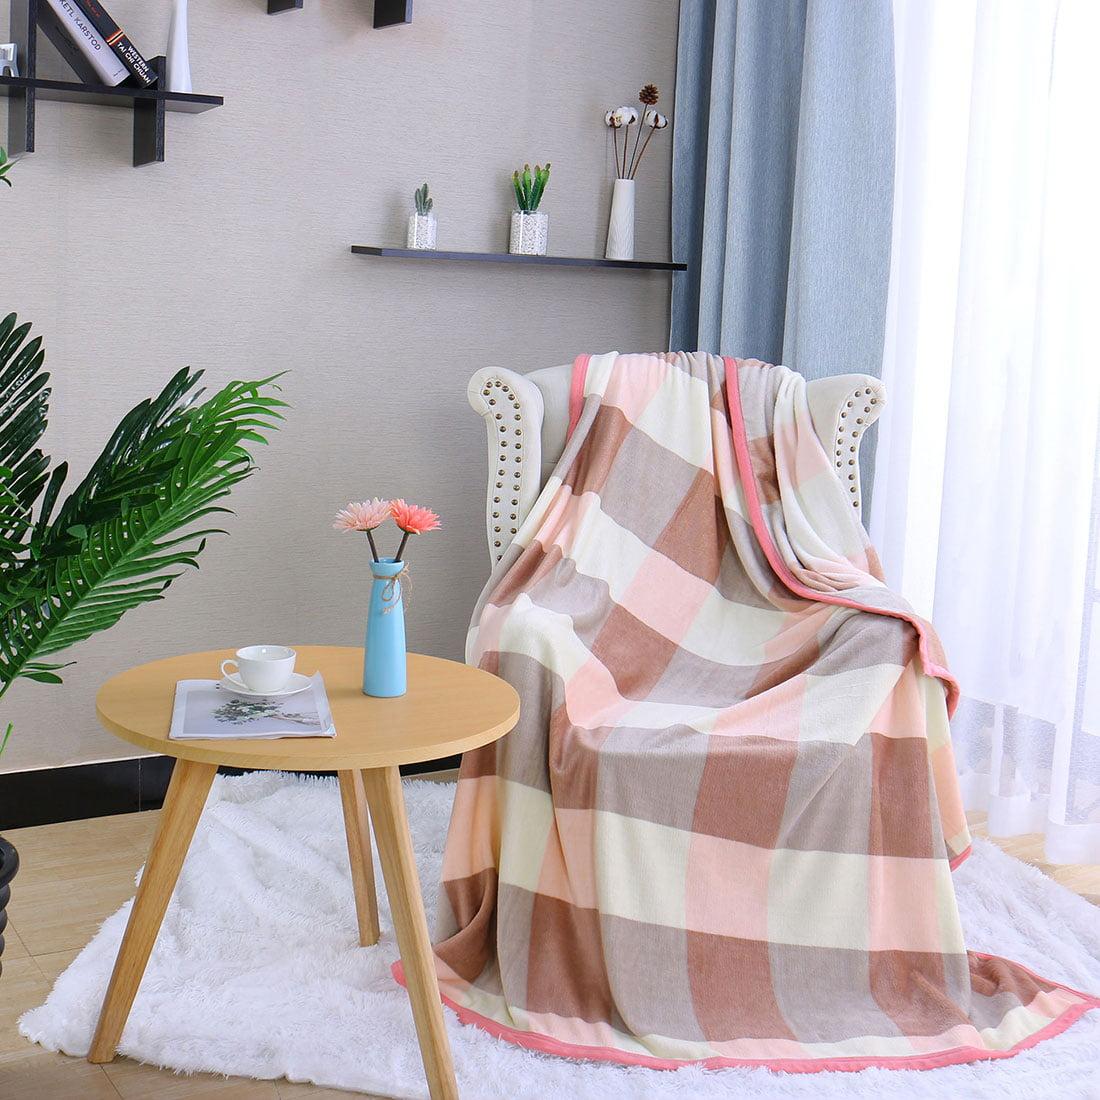 Fleece Throw Blanket Microfiber Ve-Gas Golden Knights Flannel Warm Bed Blanket for Adults//Kids//Pet//Couch